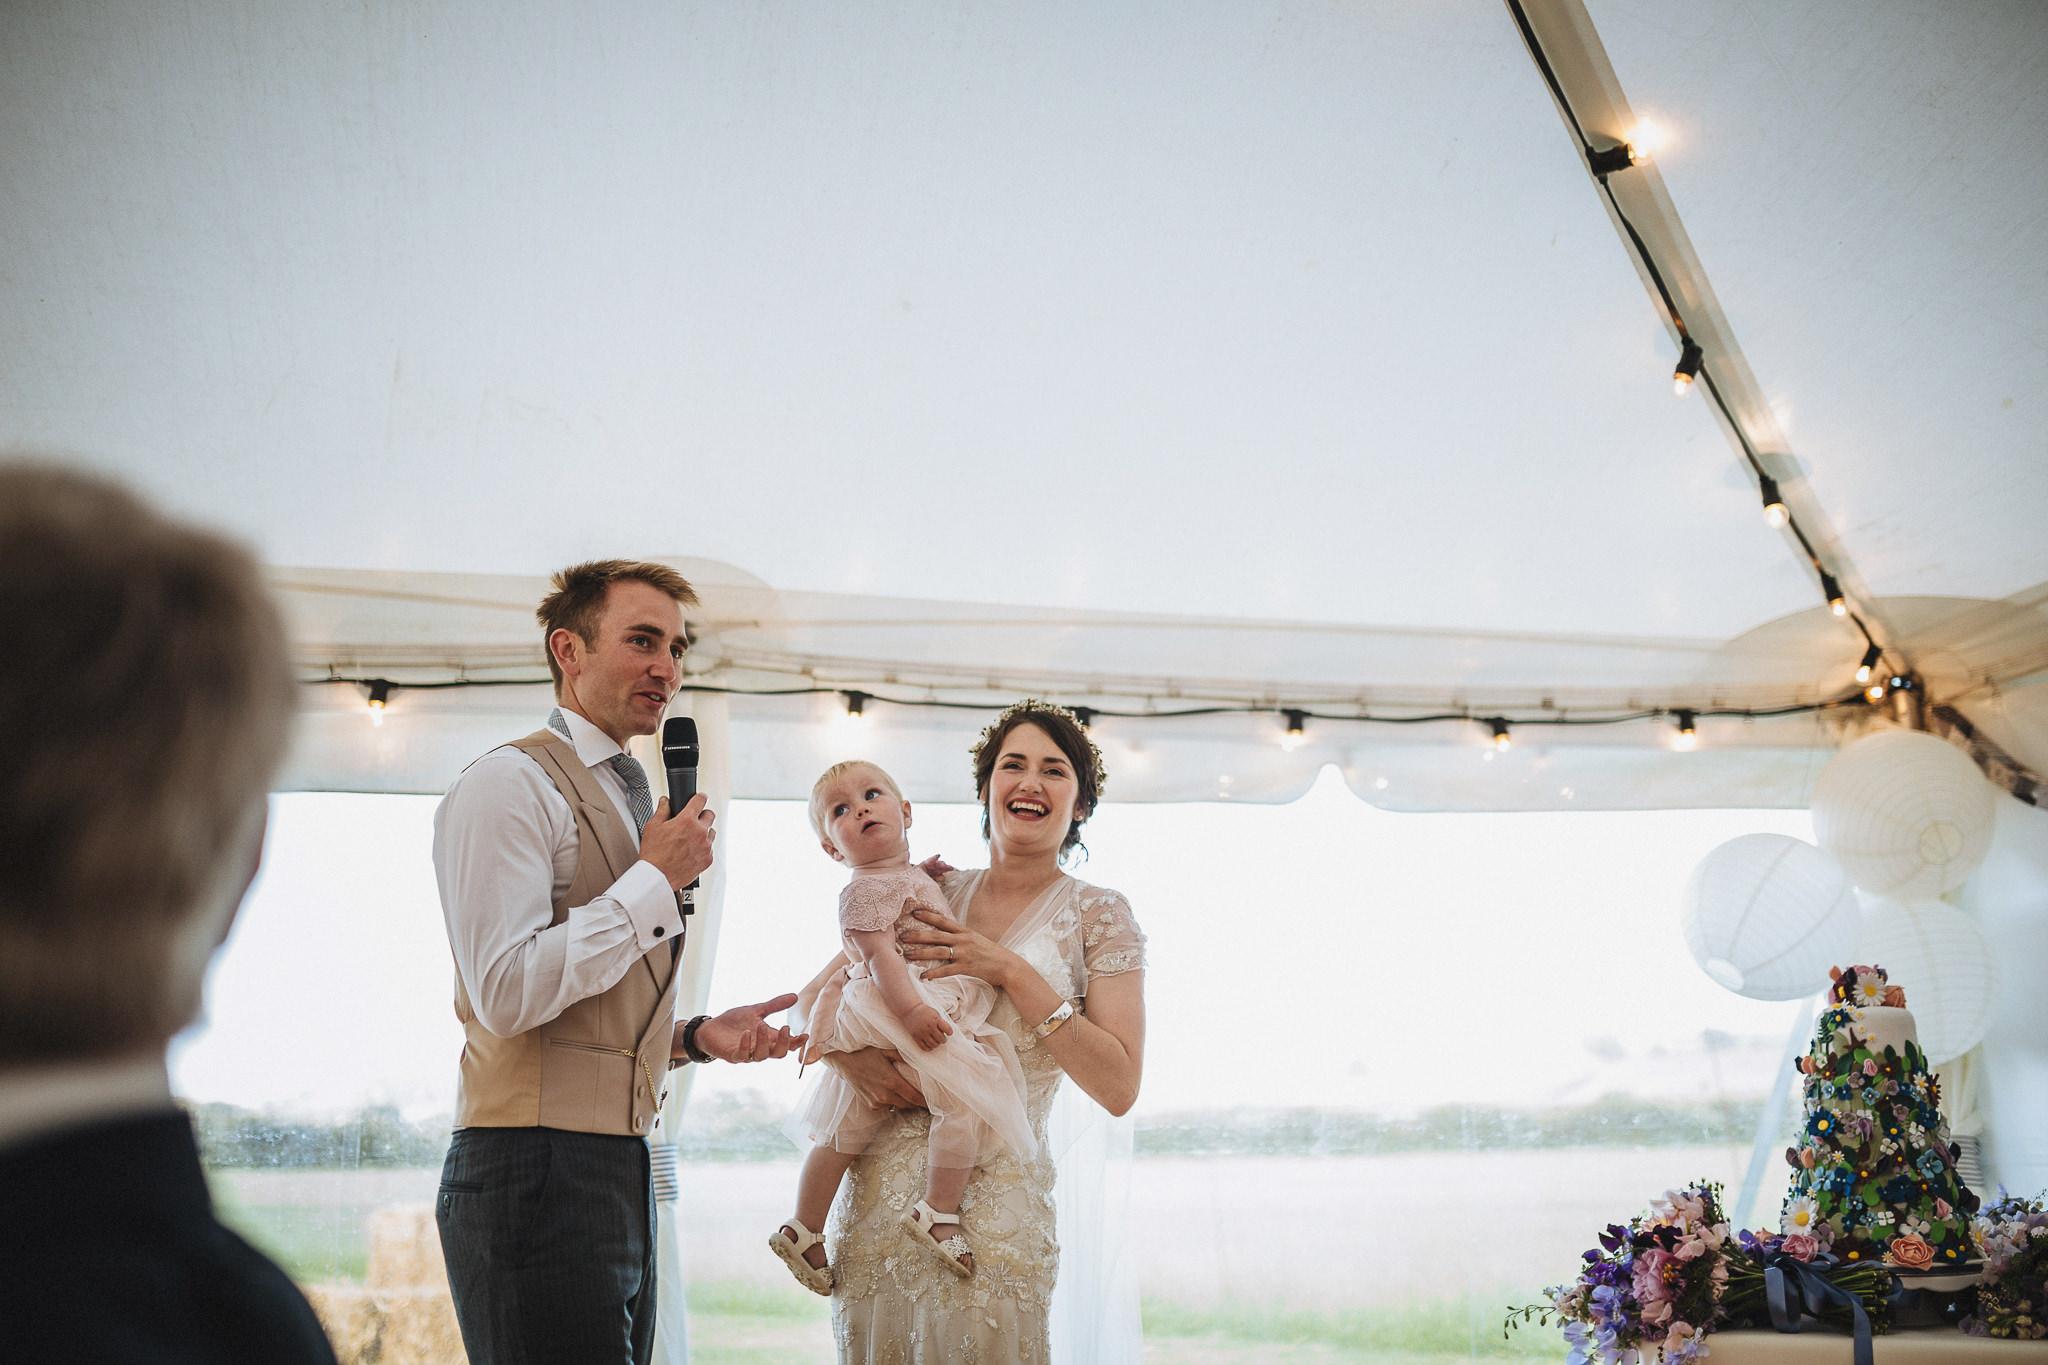 paul-marbrook-Farm-Wedding-Photographer-Lancashire-90060